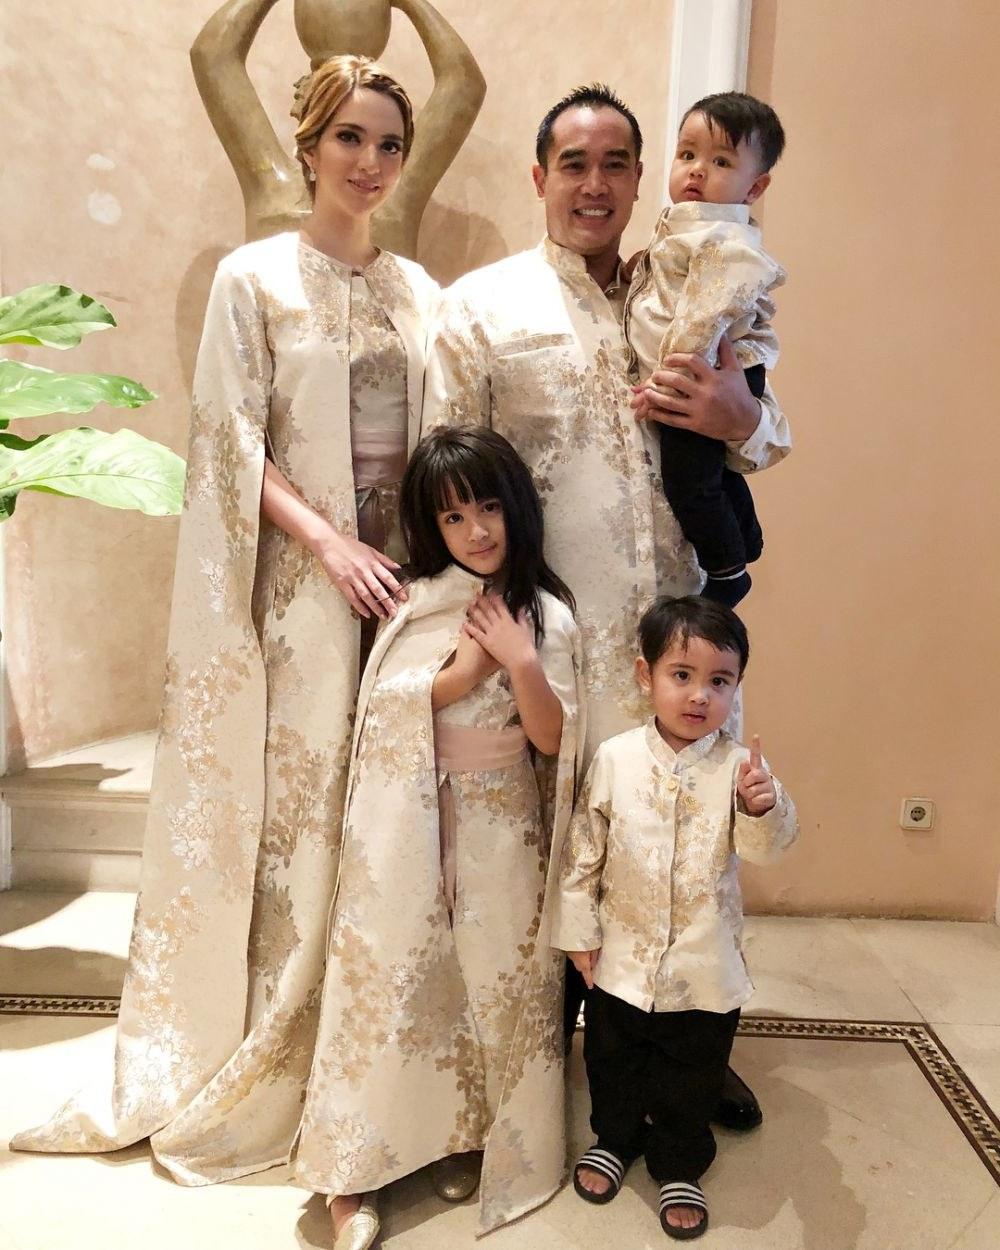 Design Baju Lebaran Keluarga Rldj Potret 16 Seleb Pakai Baju Kembaran Saat Lebaran Kompak Abis